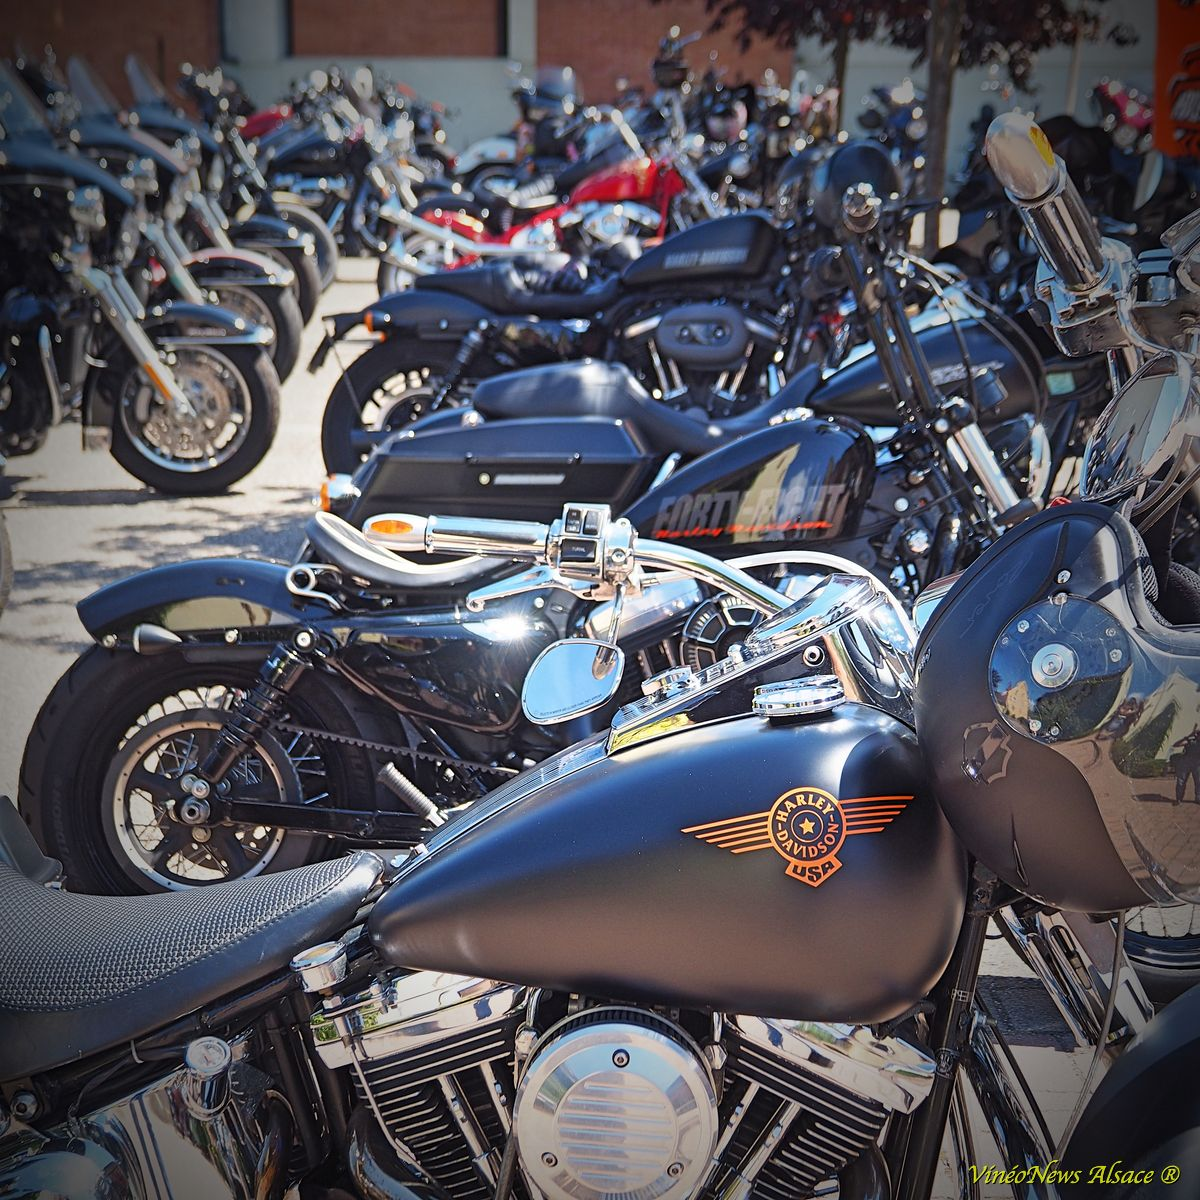 Foire Aux Vins, Steve Neff, Harley-Davidson